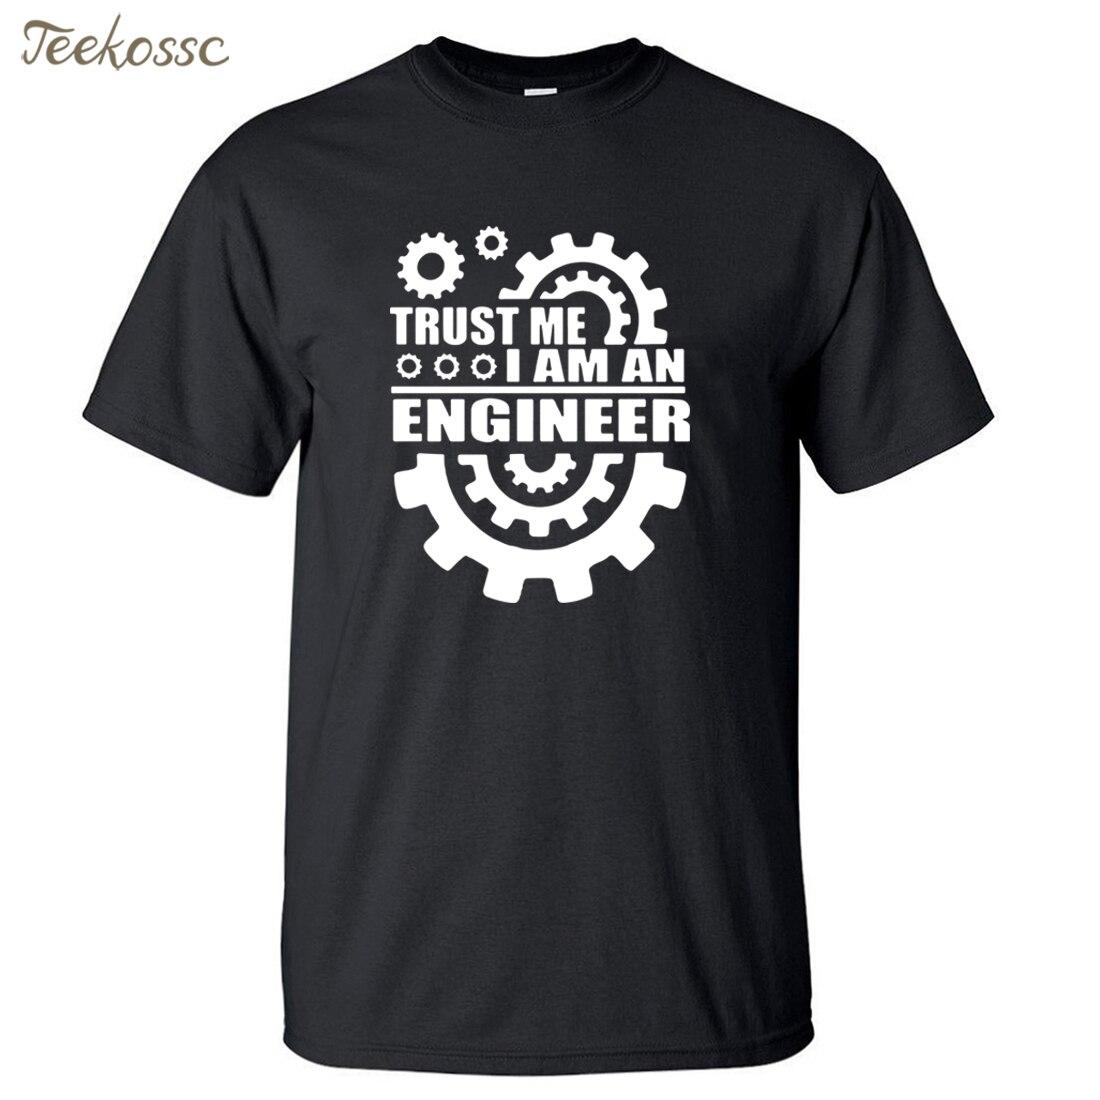 Trust Me I Am An Engineer Humor T-shirts Men 2018 Summer New Fashion Men T-Shirt High Quality Cotton O-neck Short Sleeve T Shirt